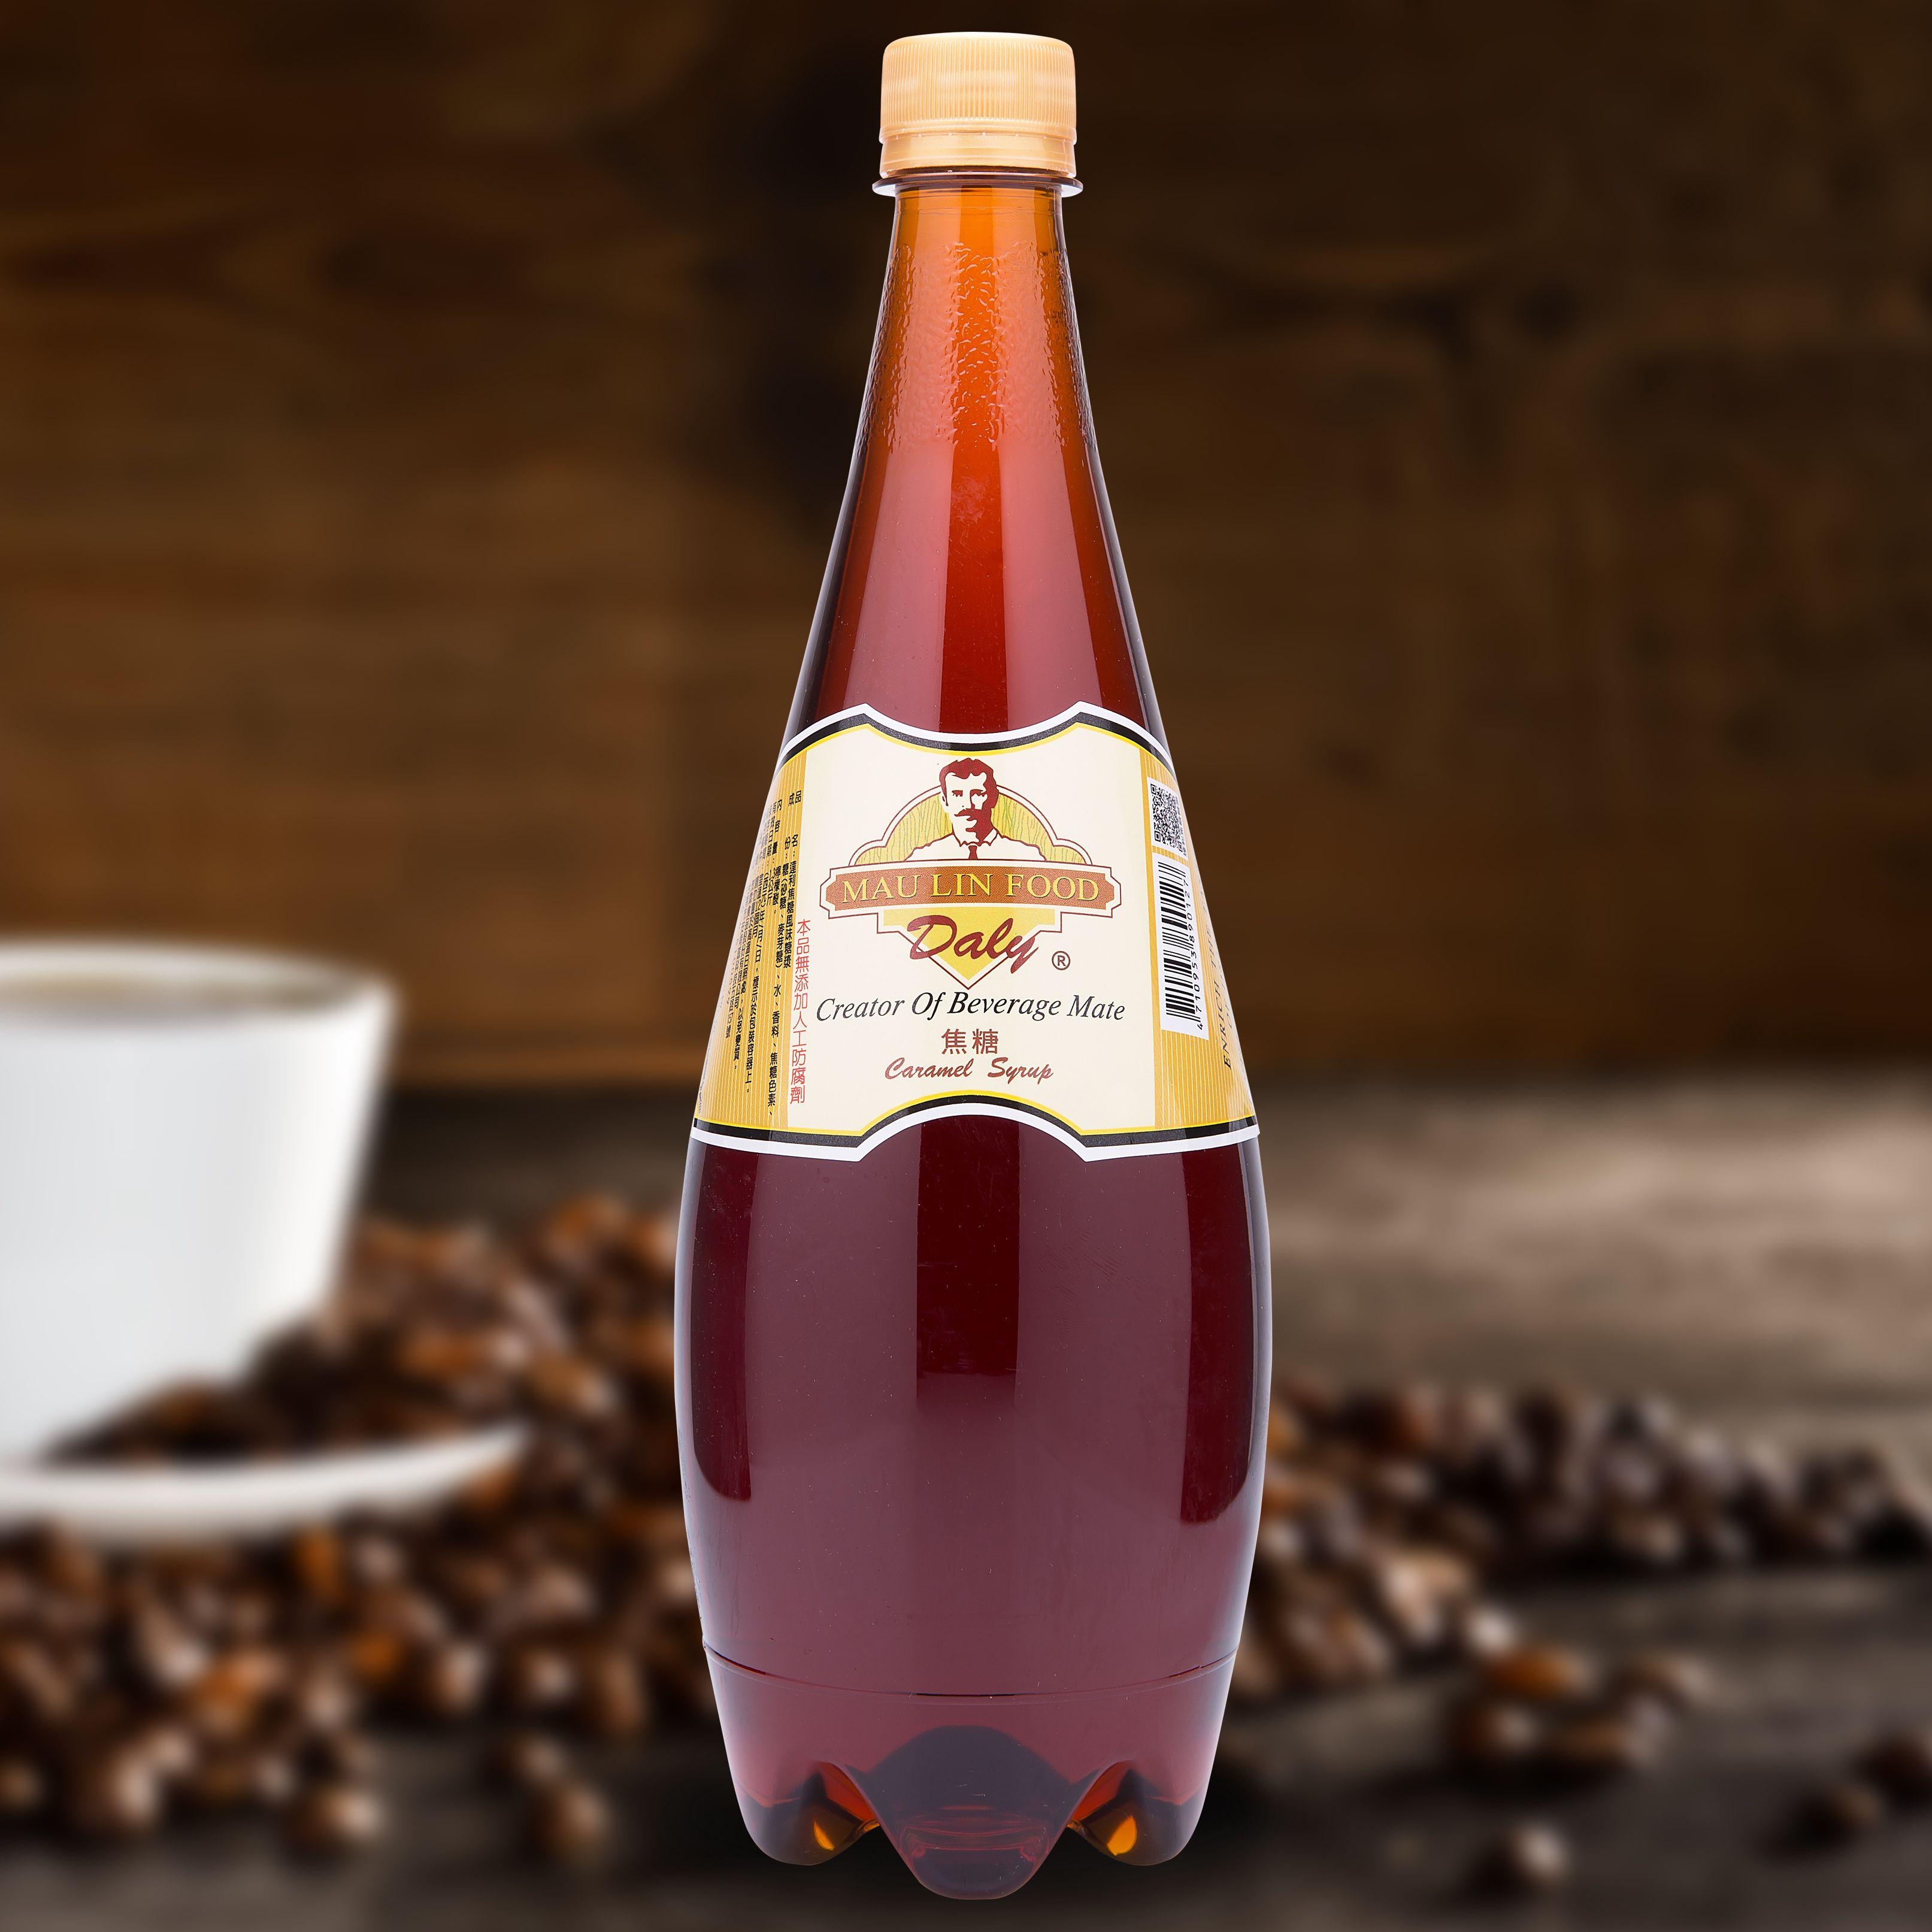 Caramel Syrup #coffee #milk Tea #latte #cappuccino